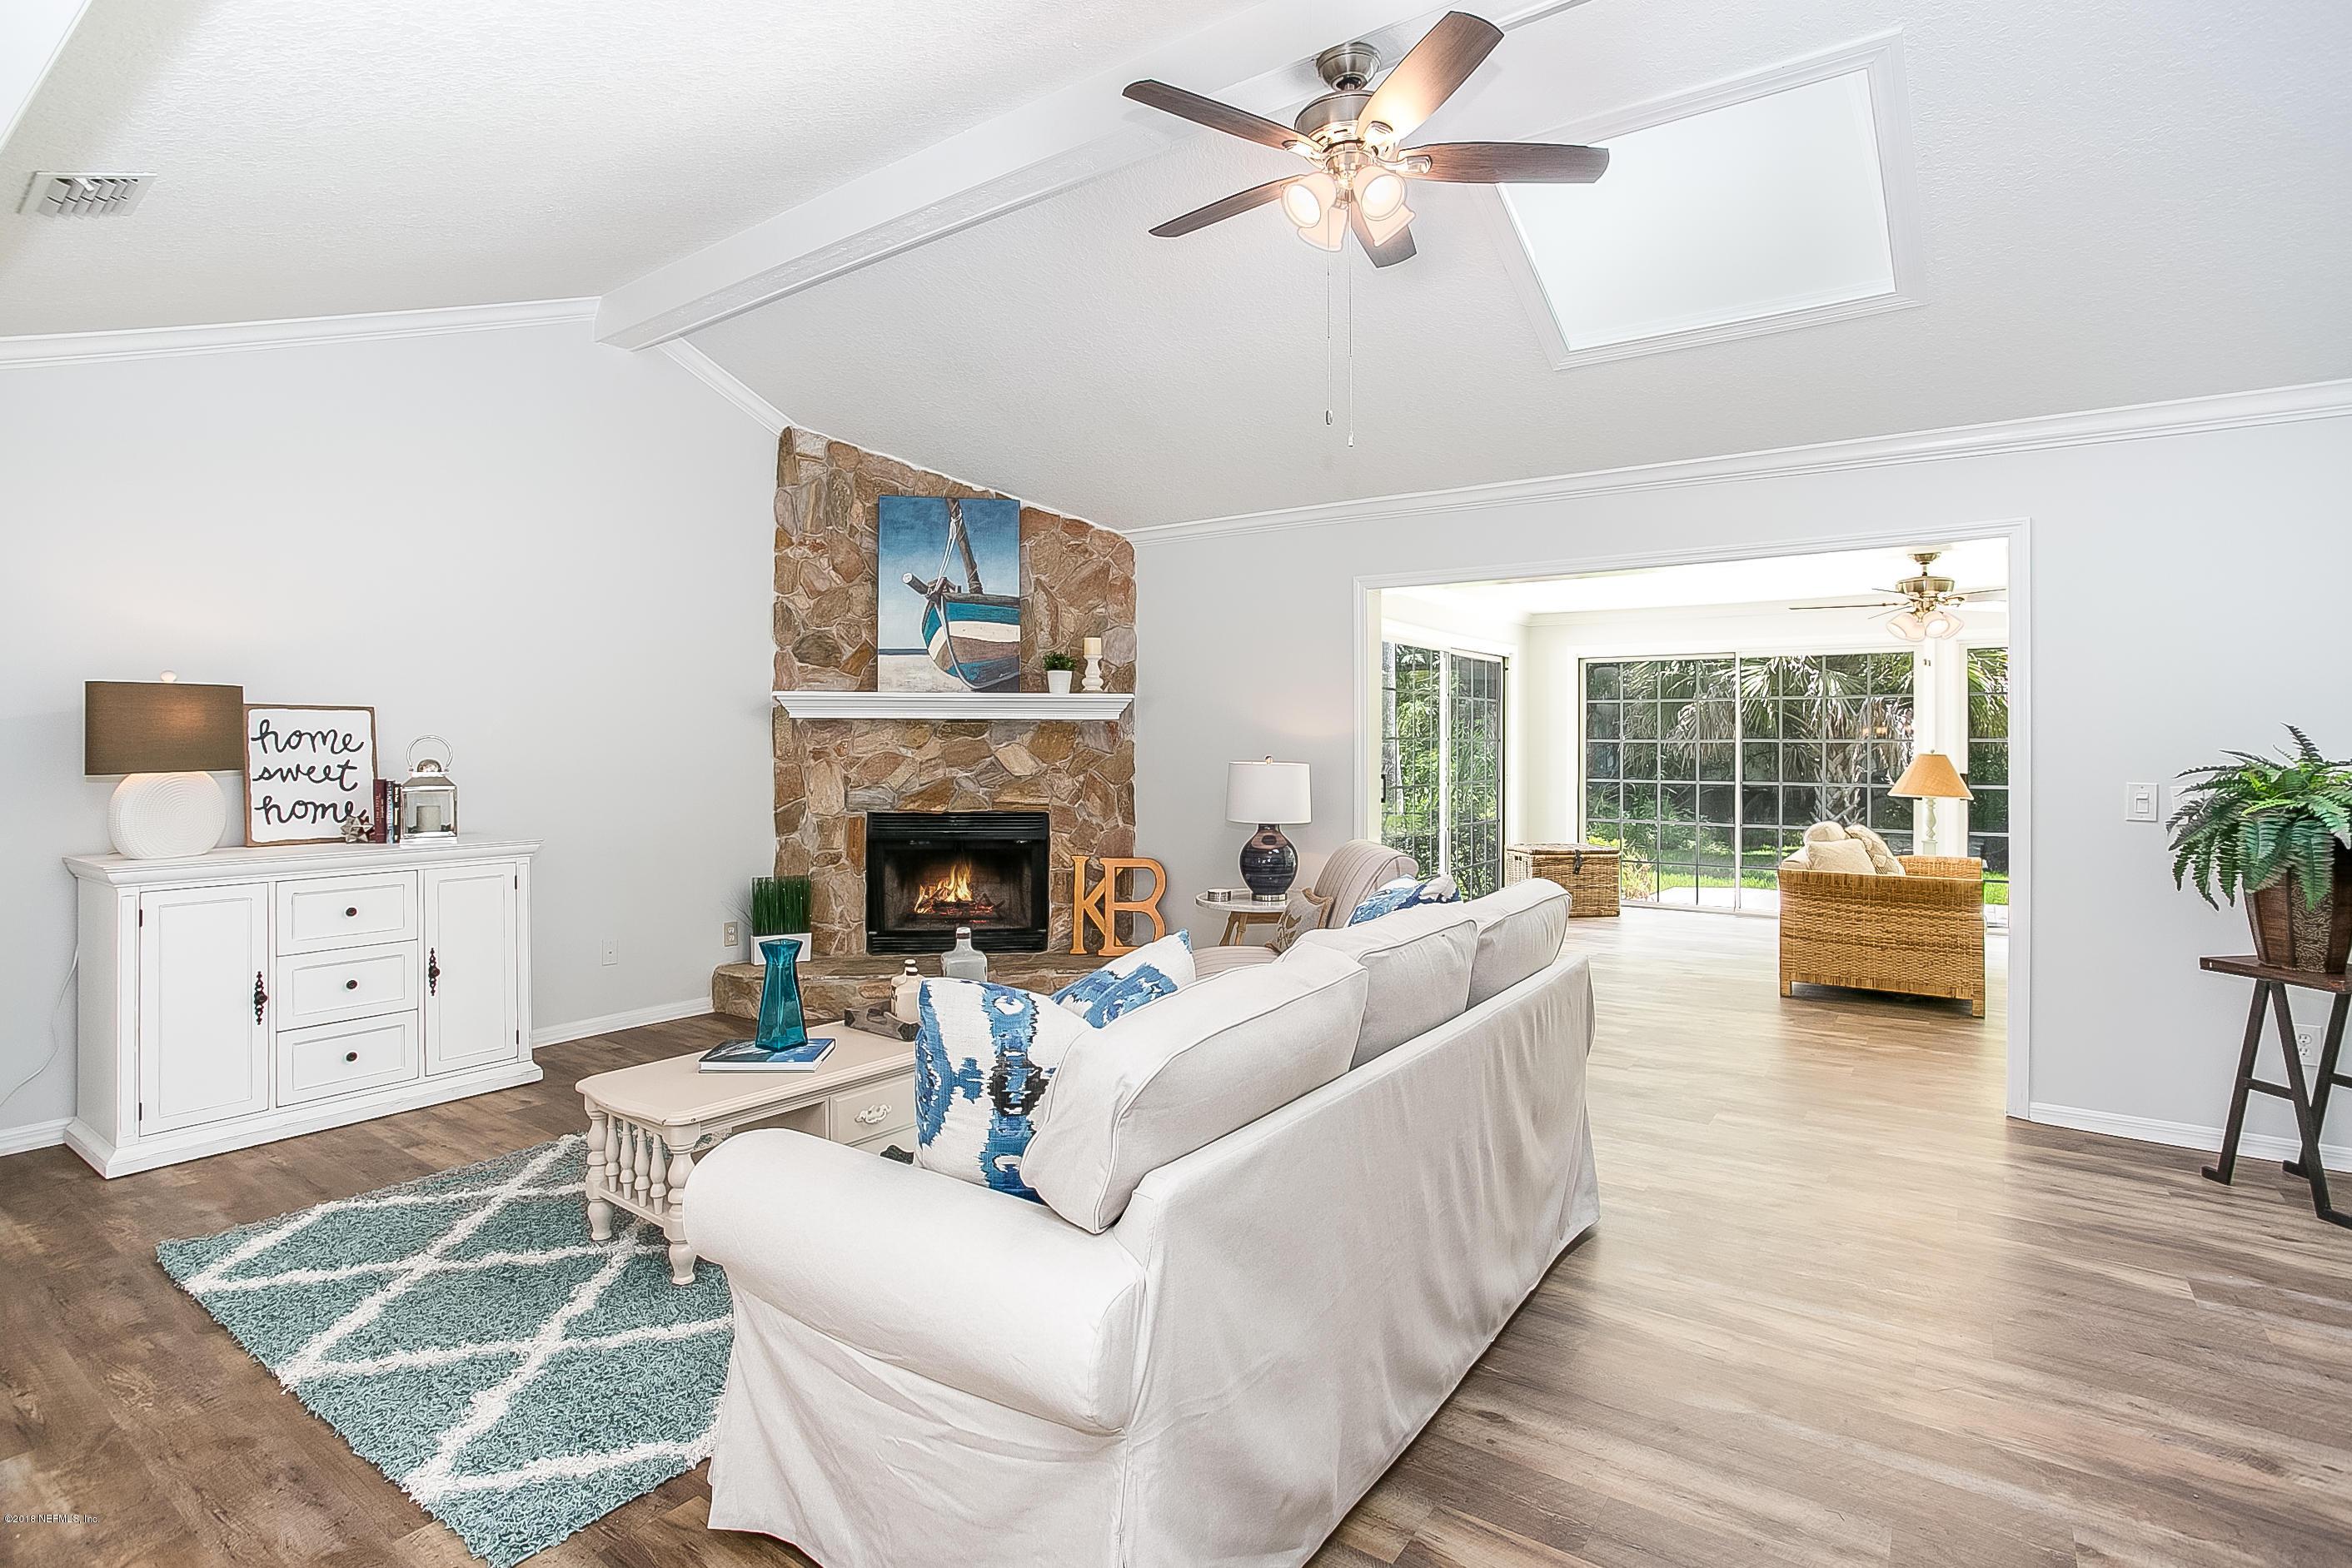 103 NEPTUNE, PONTE VEDRA BEACH, FLORIDA 32082, 3 Bedrooms Bedrooms, ,2 BathroomsBathrooms,Residential - single family,For sale,NEPTUNE,944787